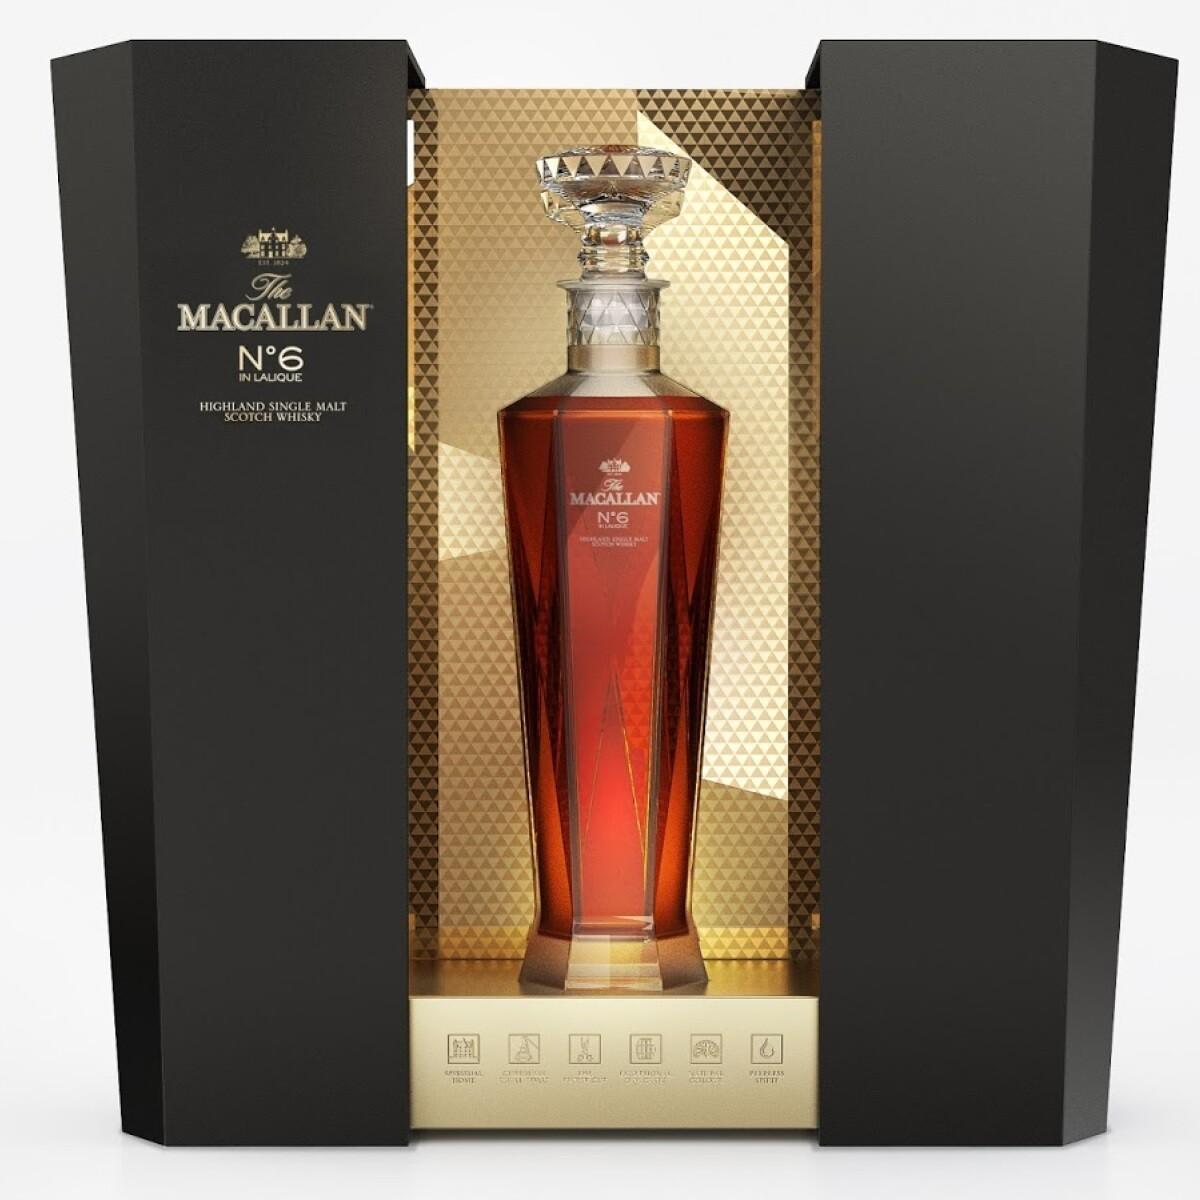 Macallan 'No6 in Lalique' Single Malt Scotch Whisky